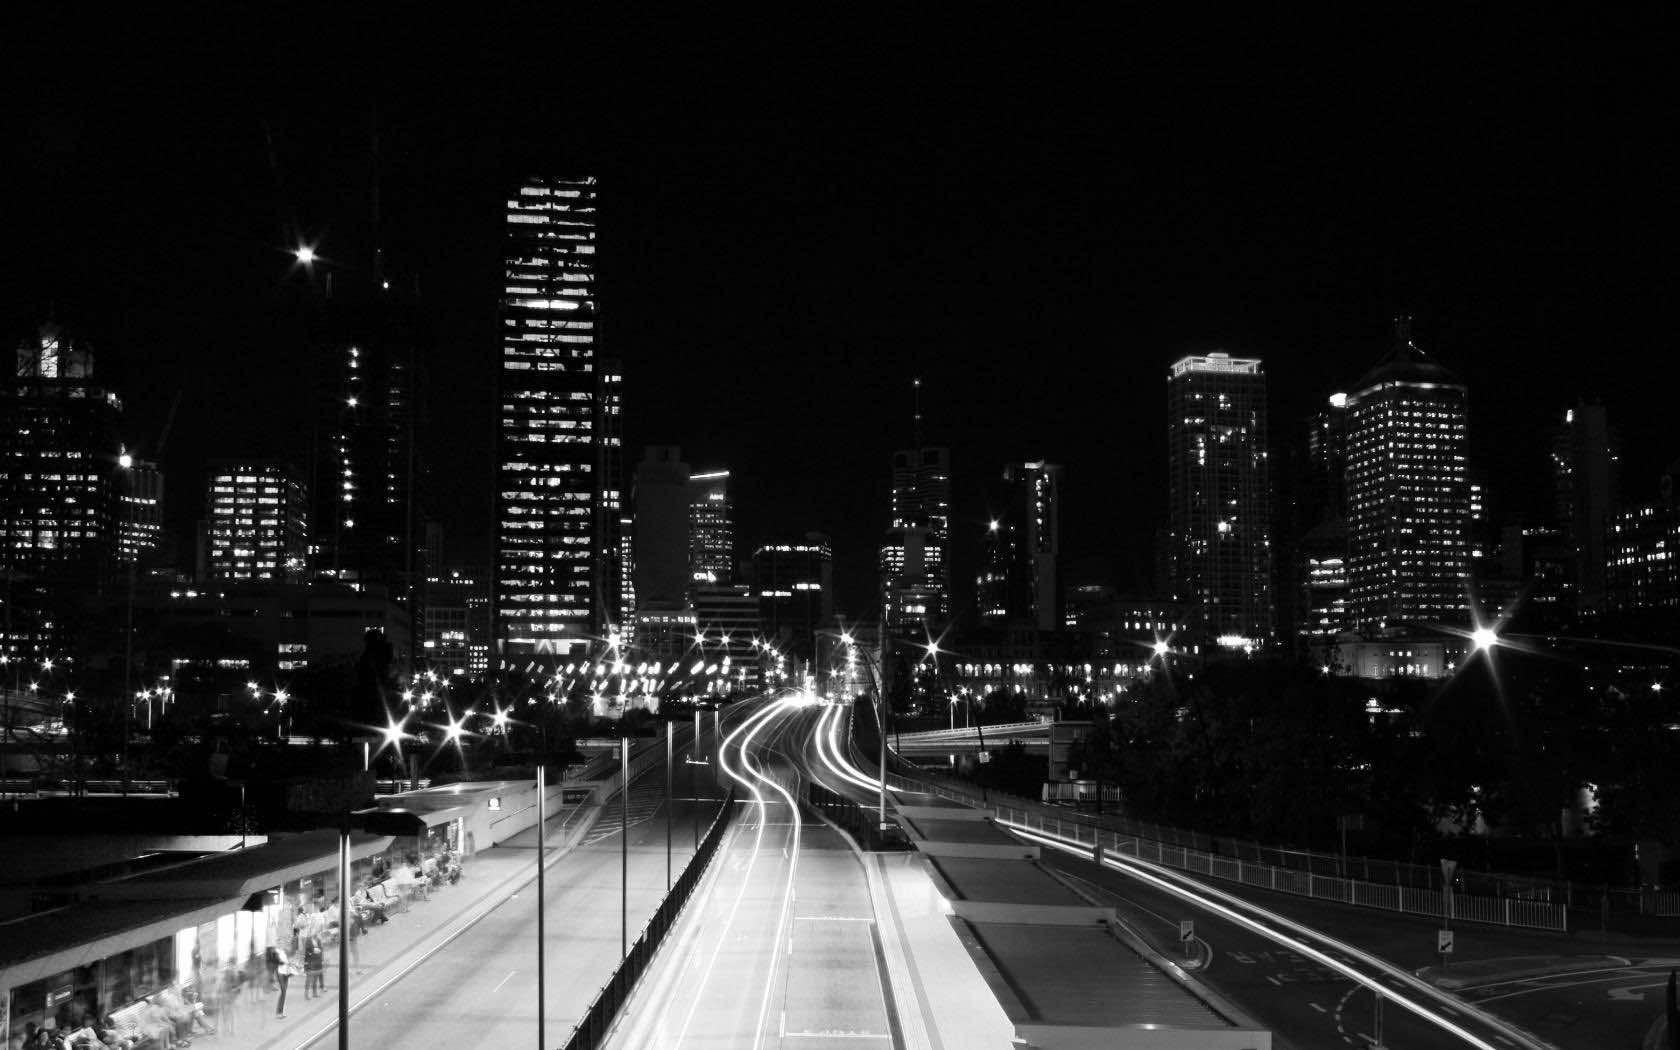 Free City HD Wallpaper Images For Desktop Download